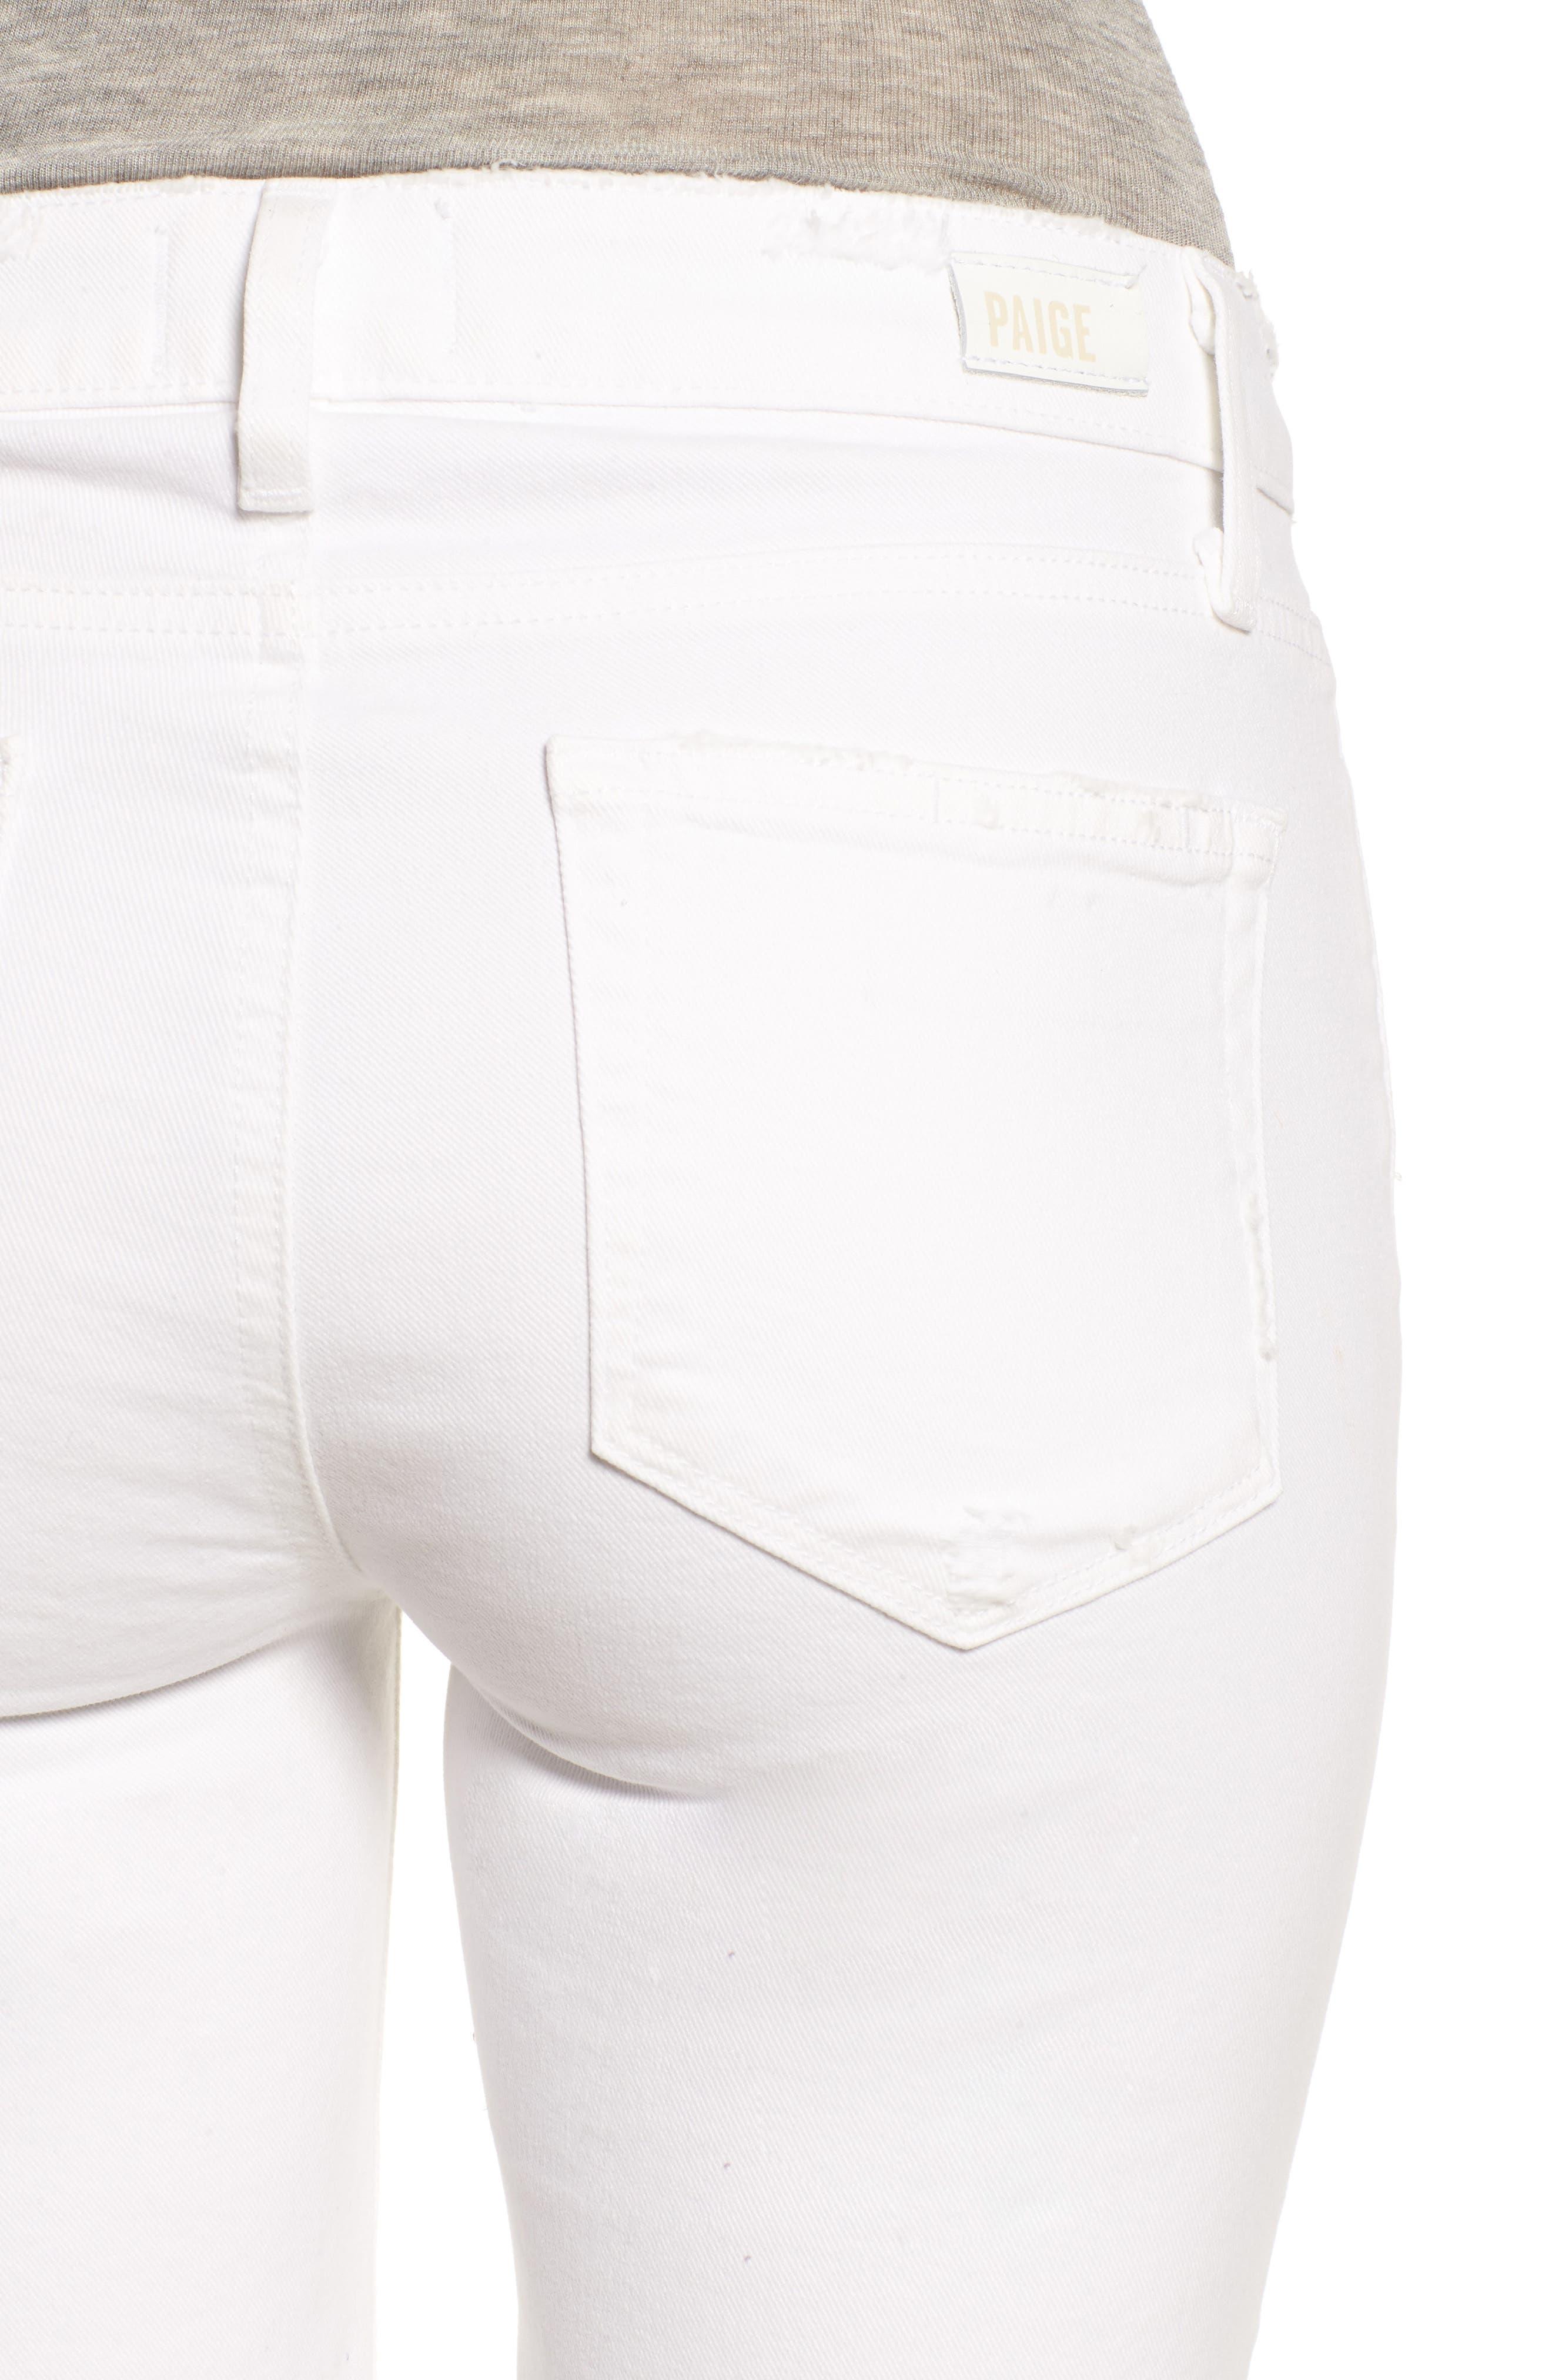 PAIGE, Skyline Raw Hem Crop Skinny Jeans, Alternate thumbnail 5, color, LIVED IN CRISP WHITE